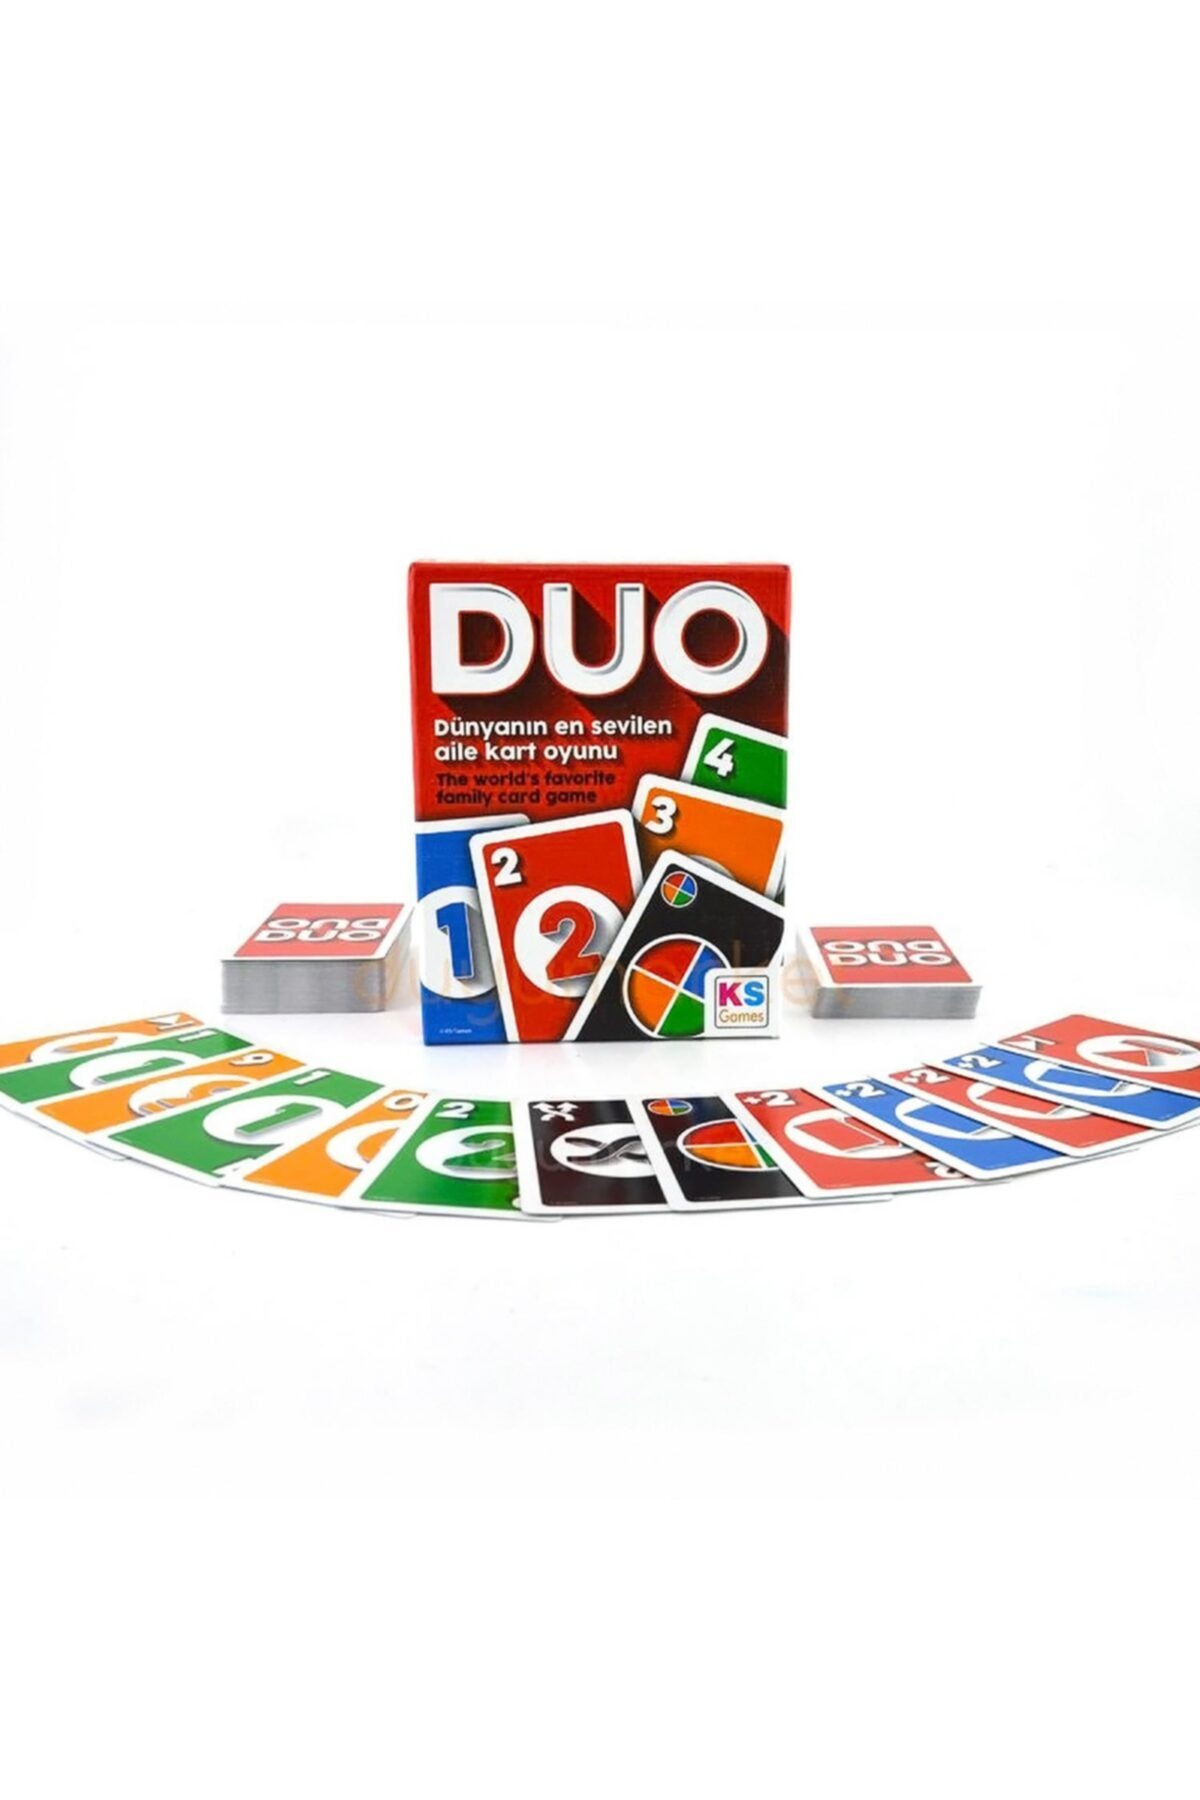 Ks Games Duo Kart Oyunu Grup Oyun Seti Masa Oyunu 2-10 Oyuncu 1